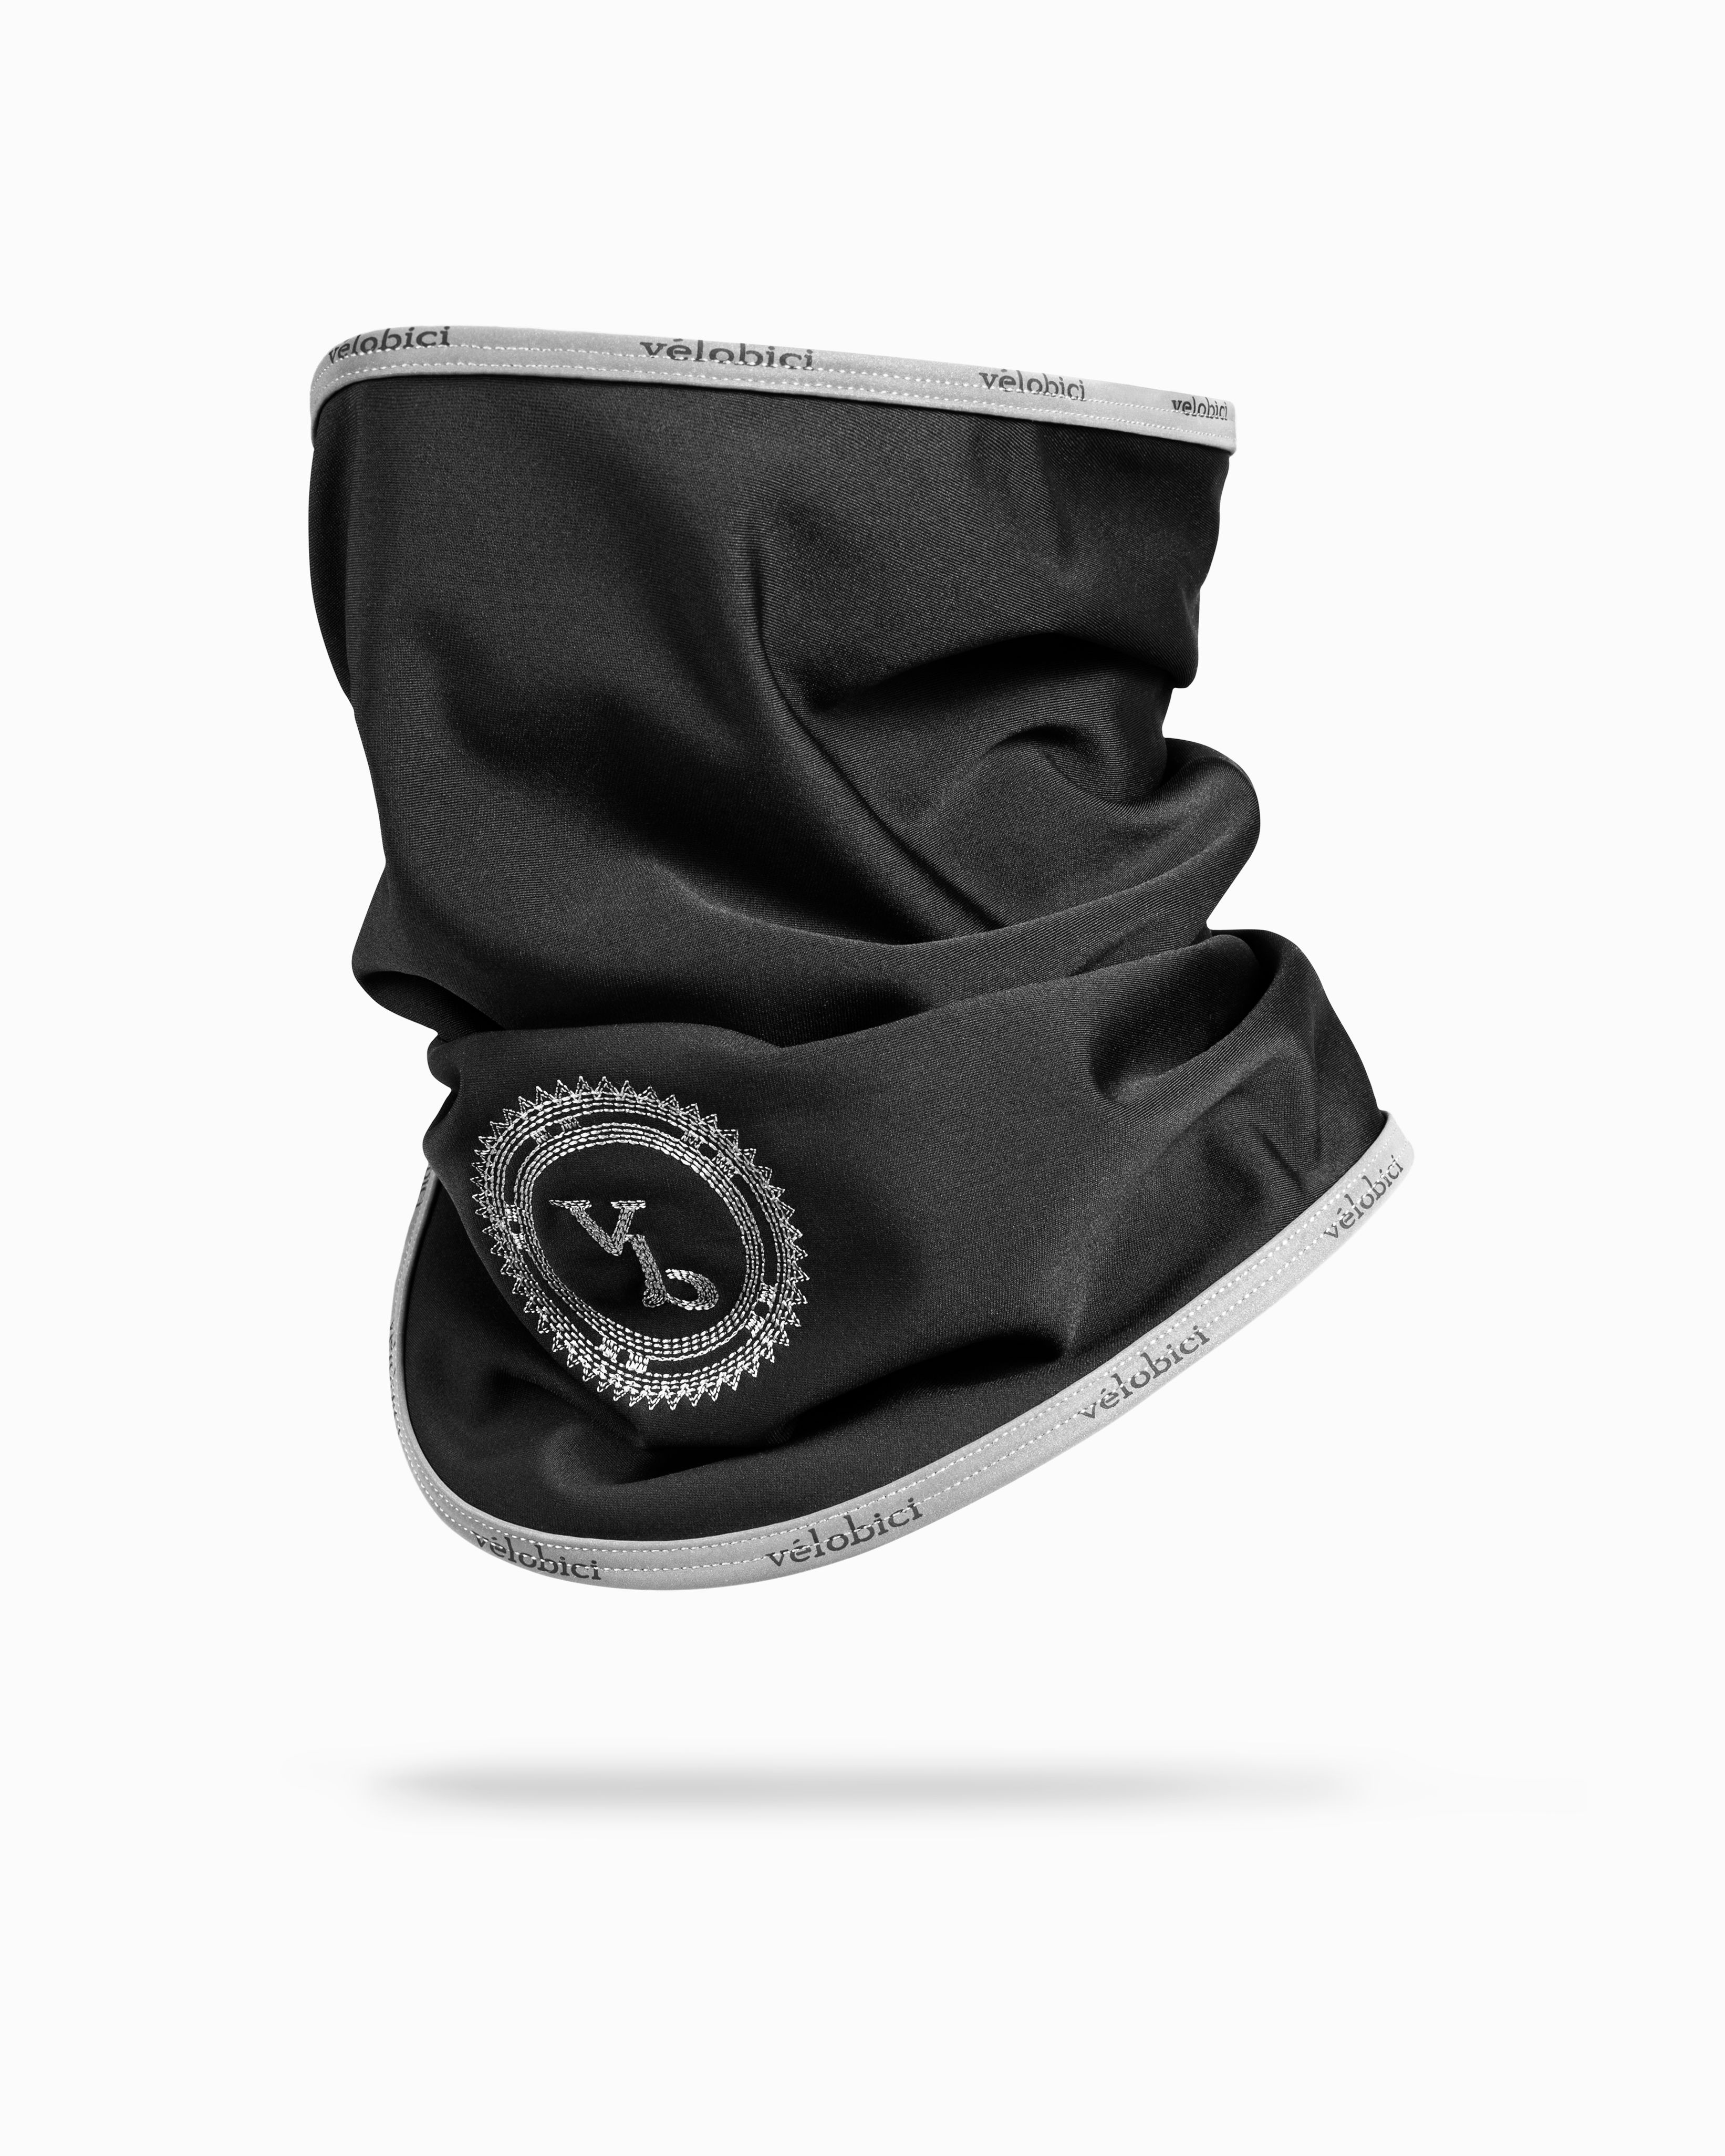 VB Thermal Collar (Black)